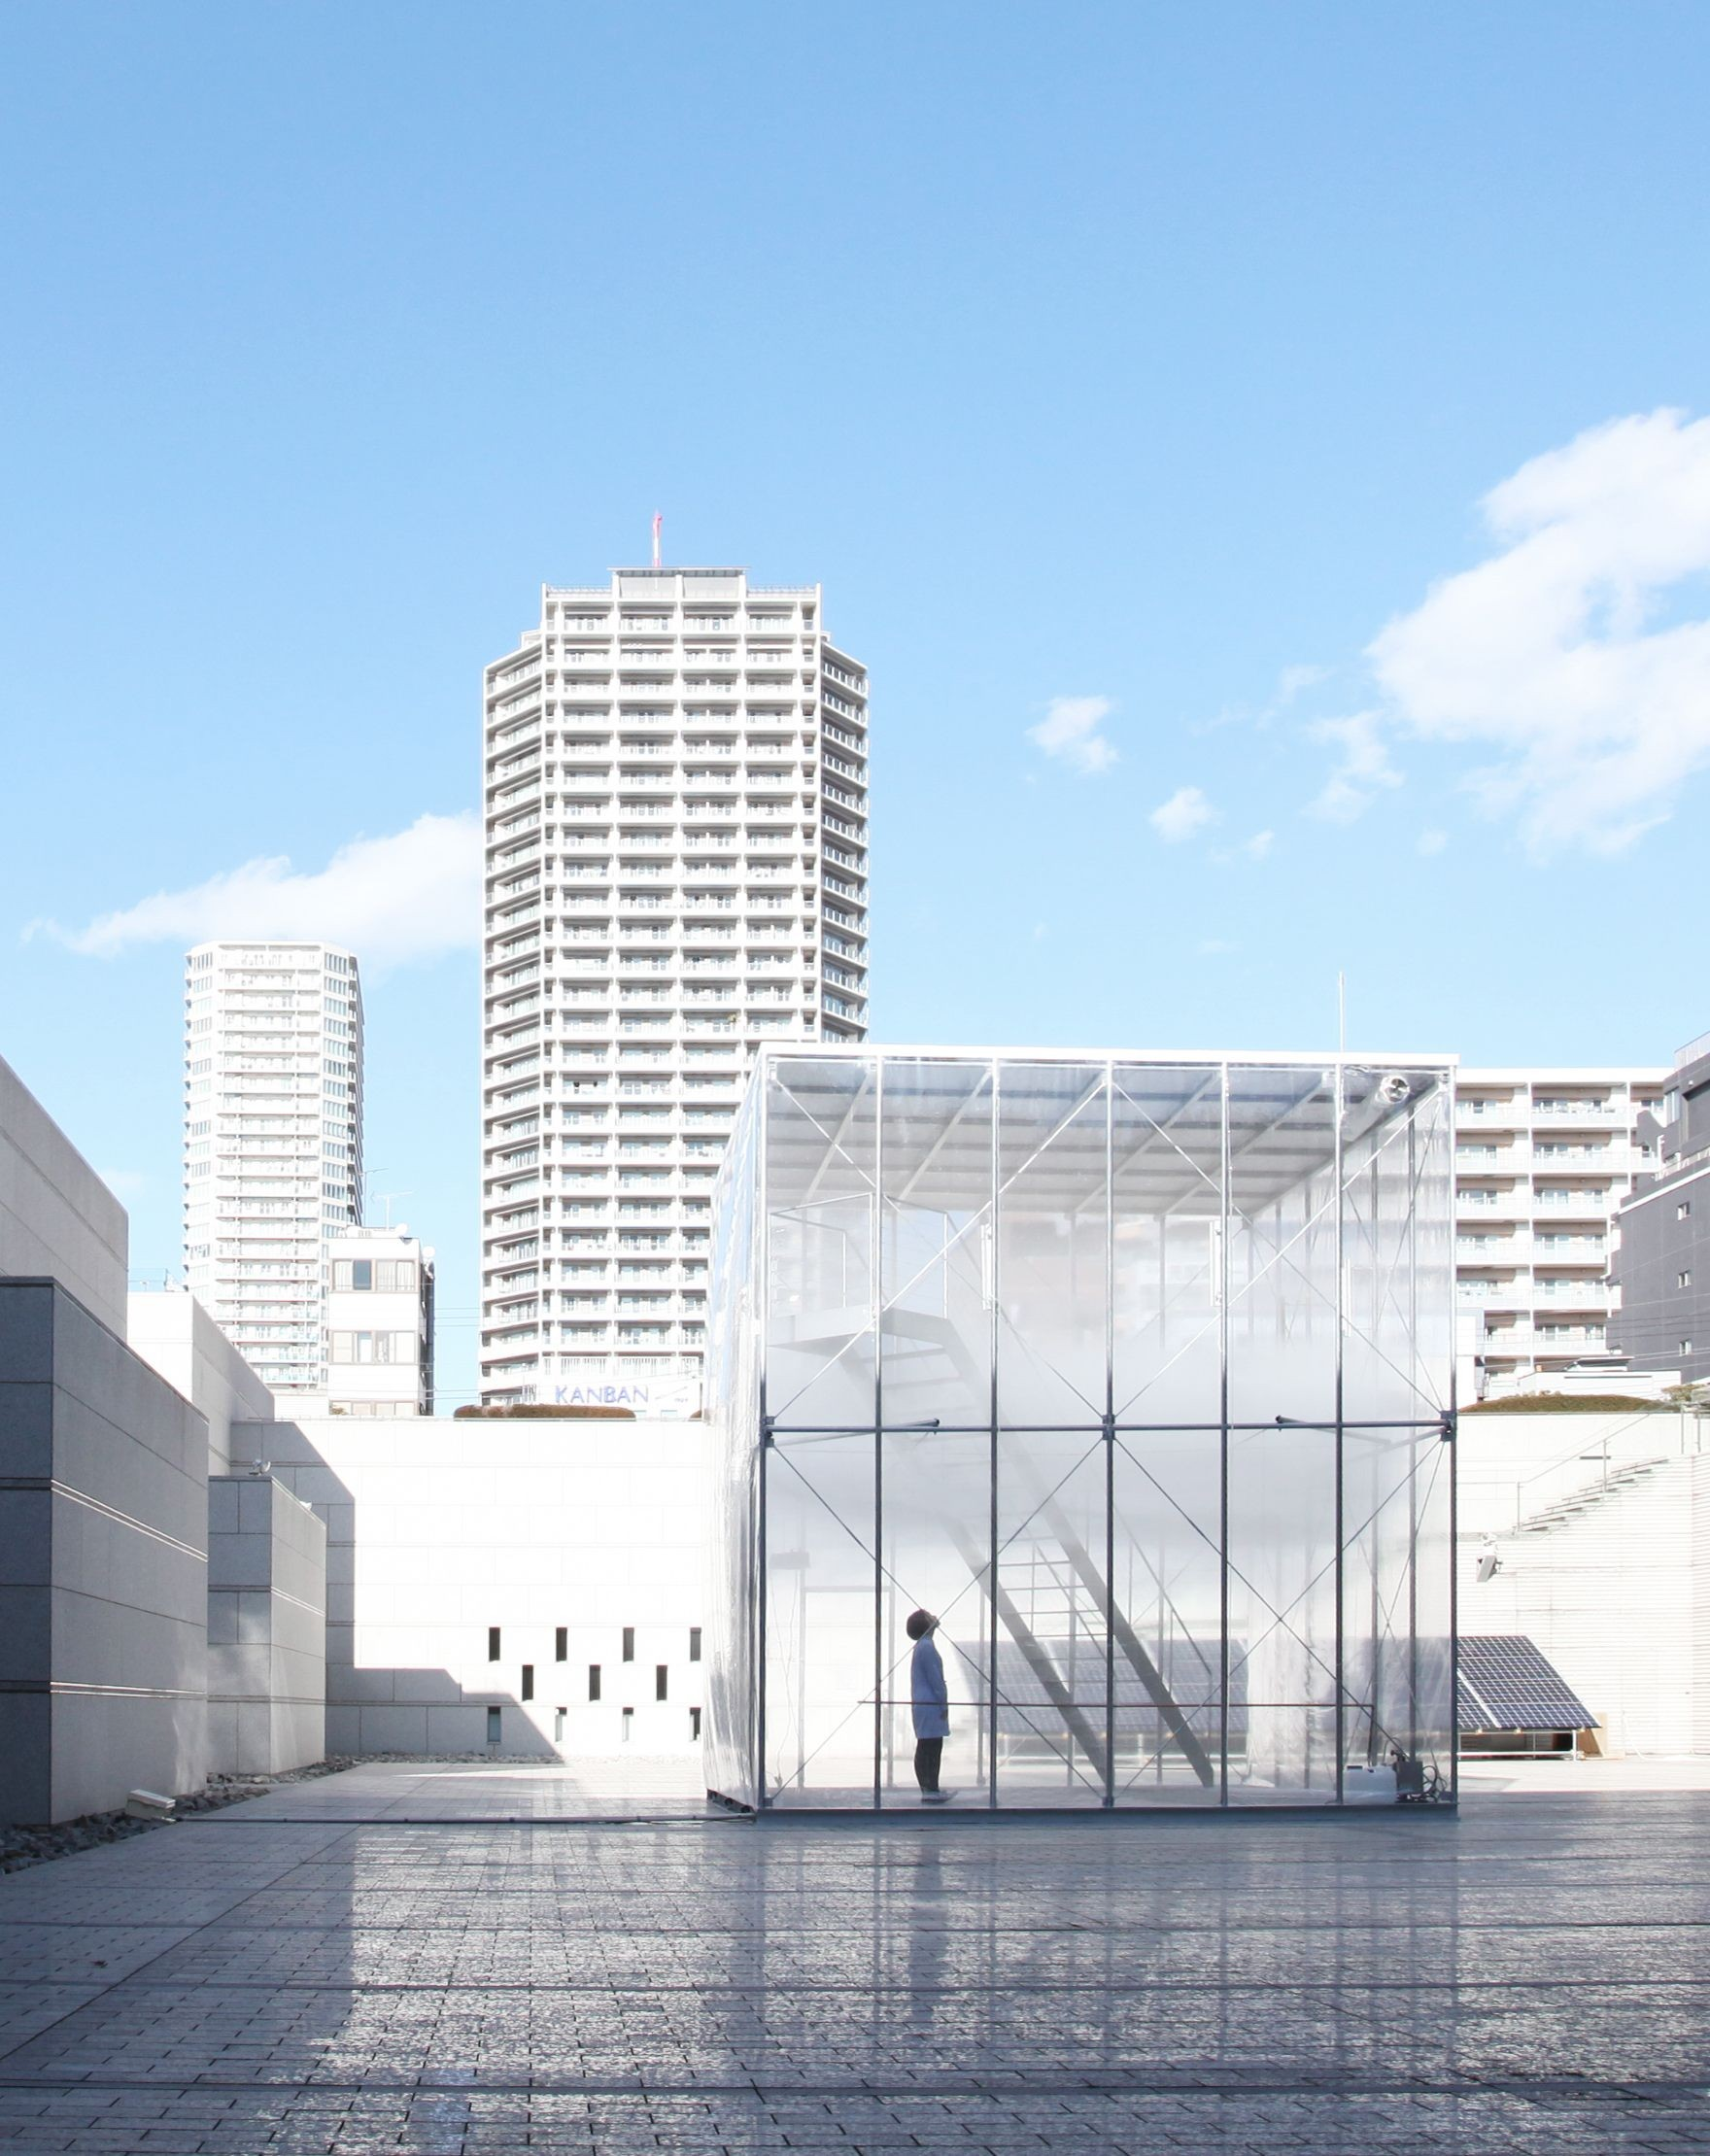 Cloudscapes at MOT / Tetsuo Kondo Architects + TRANSSOLAR / Matthias Schuler